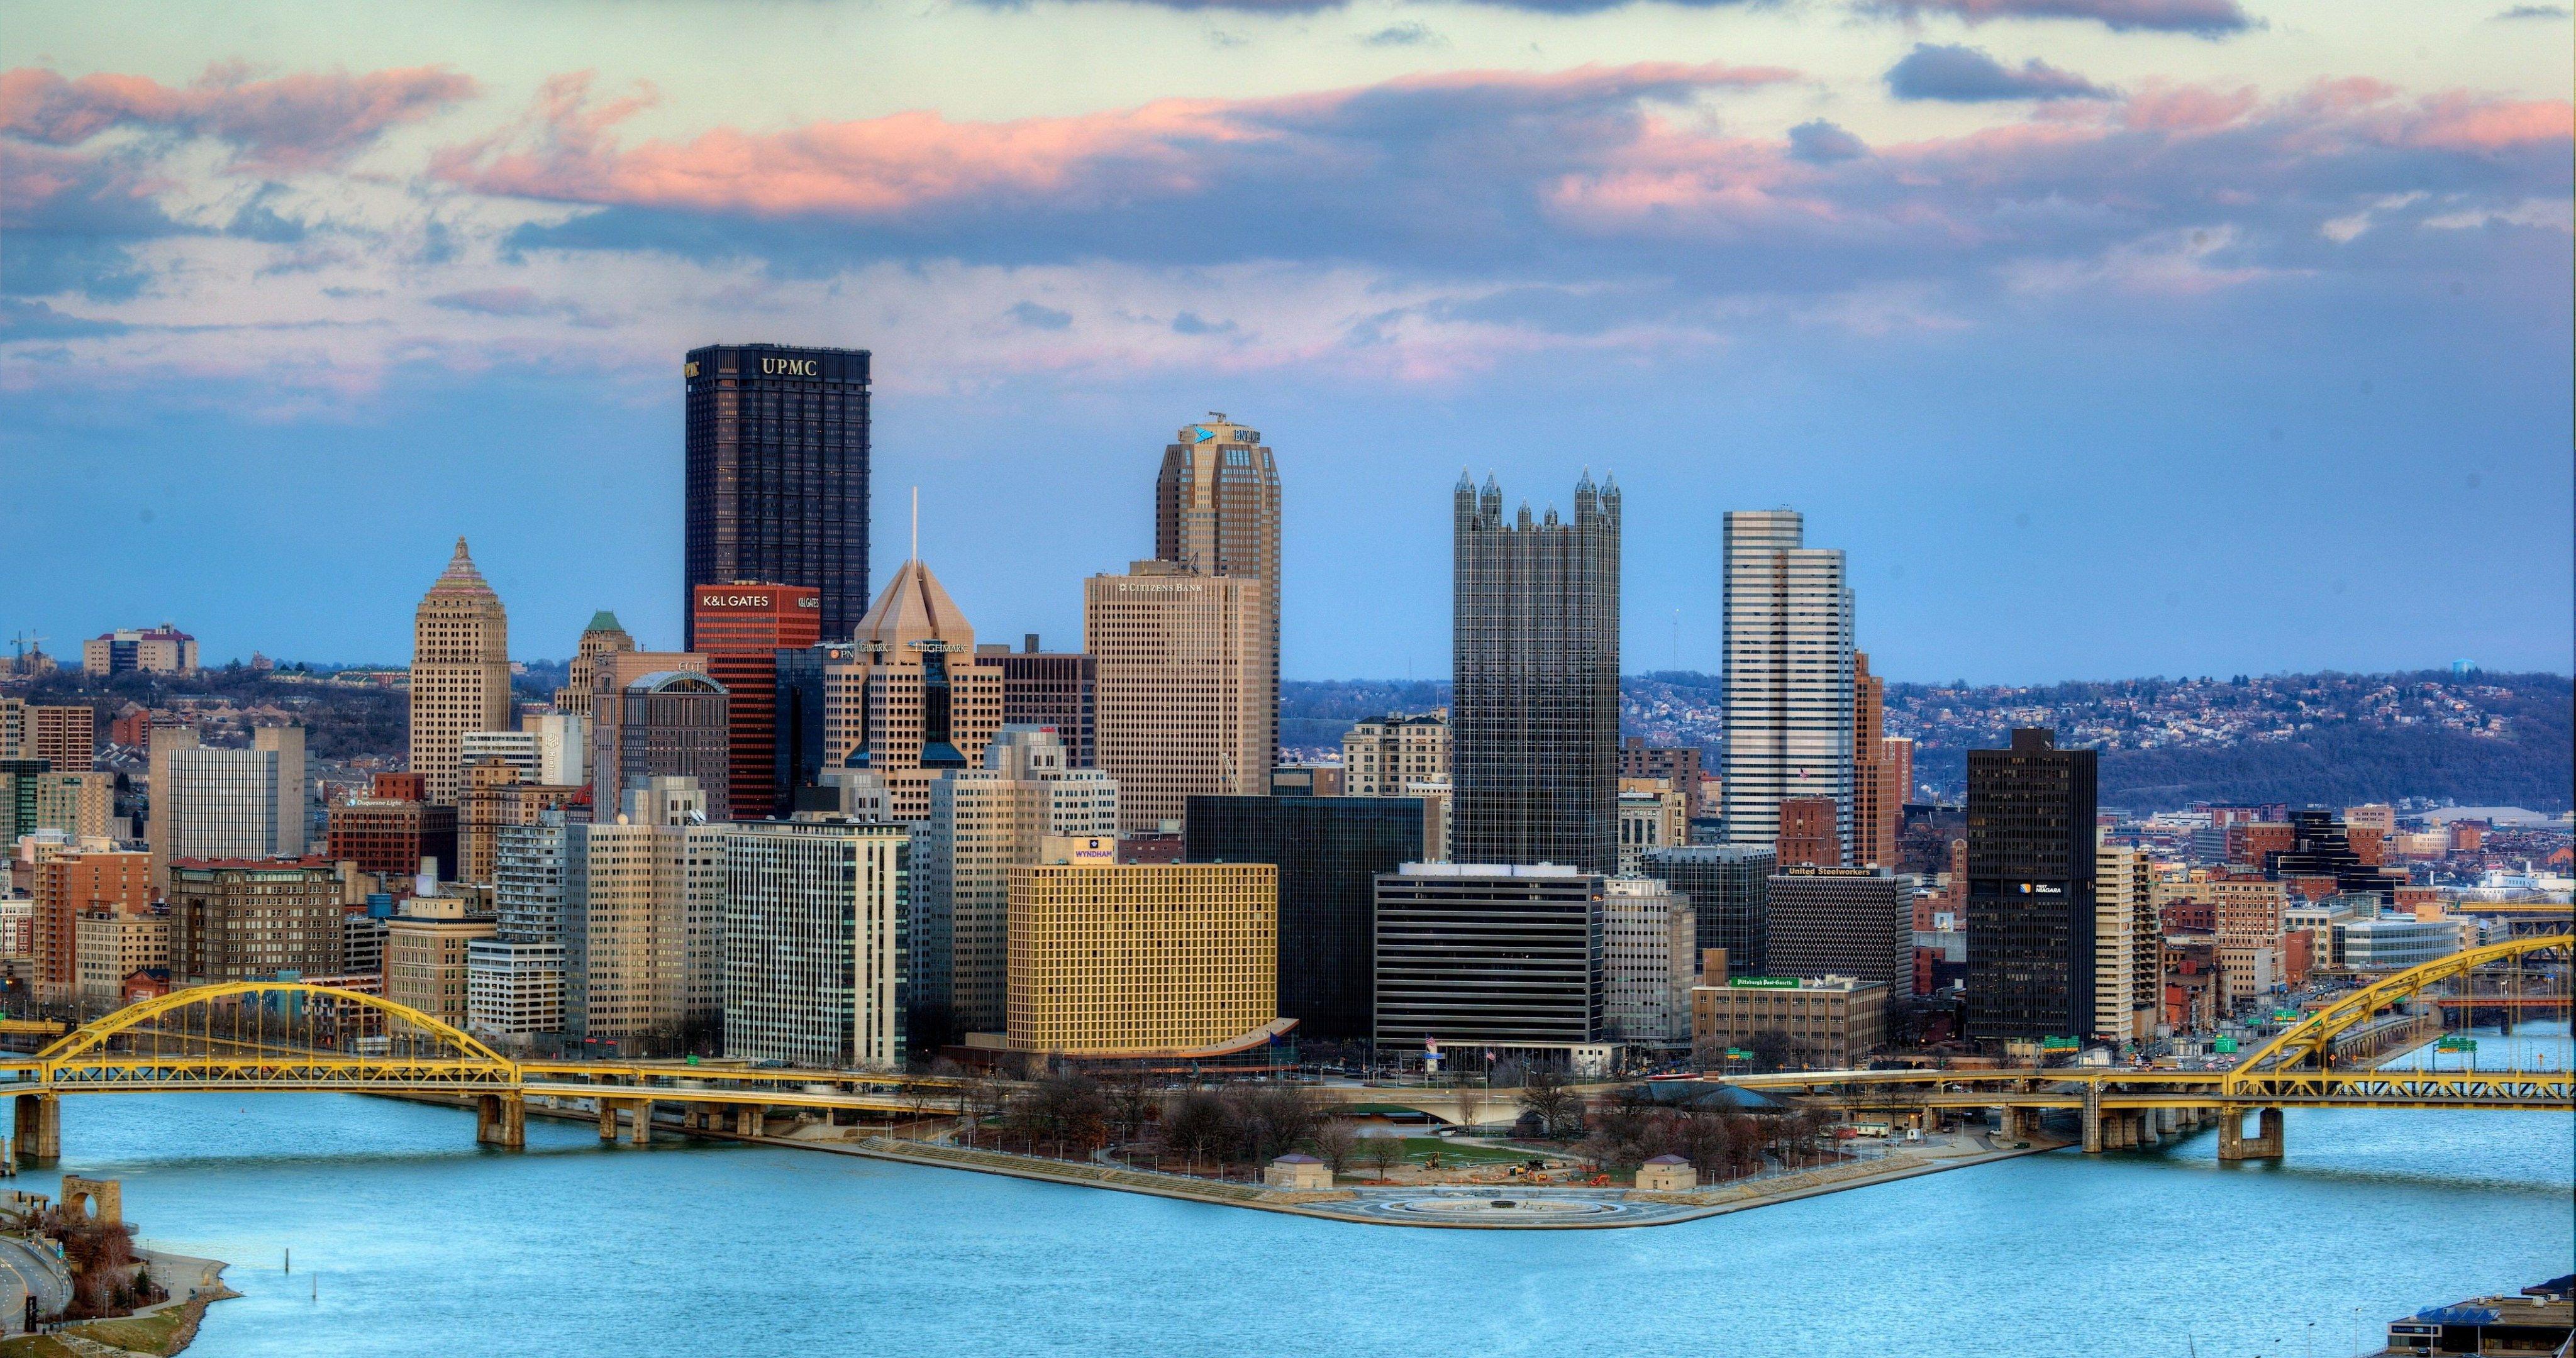 Pittsburgh Desktop Wallpaper Skyline: Usa City Pittsburgh 4k Ultra Hd Wallpaper